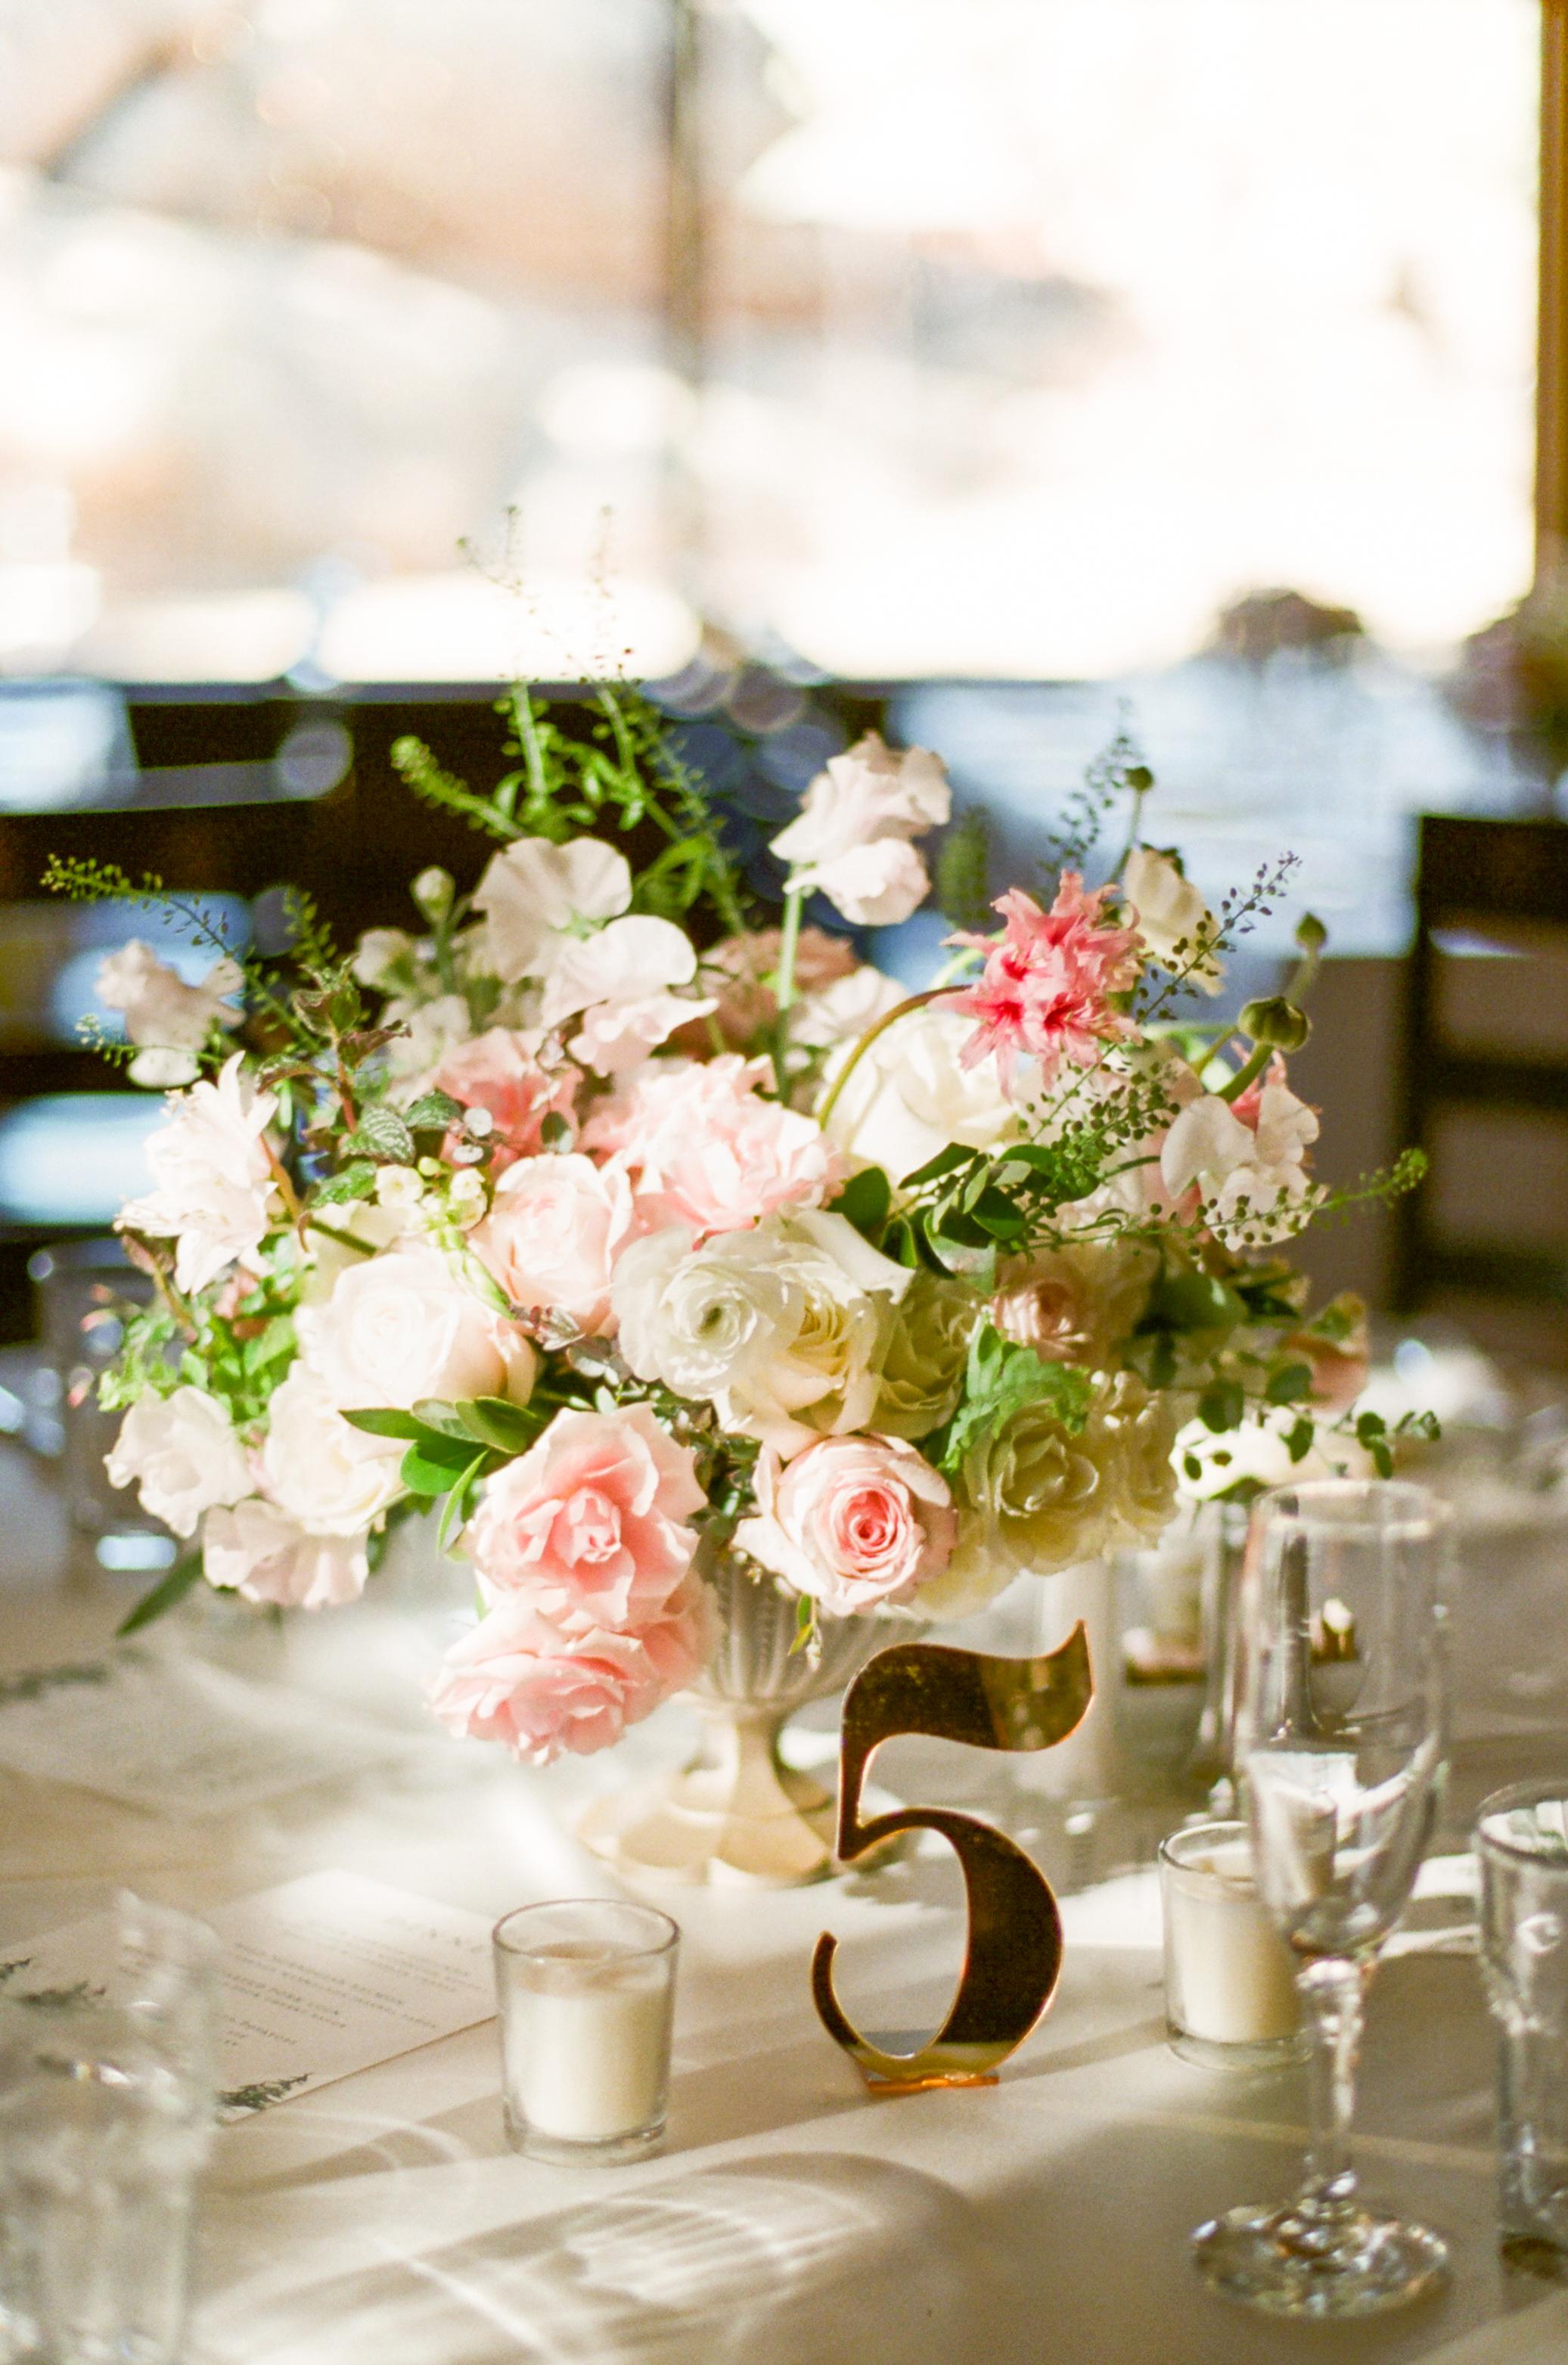 Twin_Owls_Steakhouse-wedding_photographer_Estes_Park_Lisa_ODwyer-497.jpg